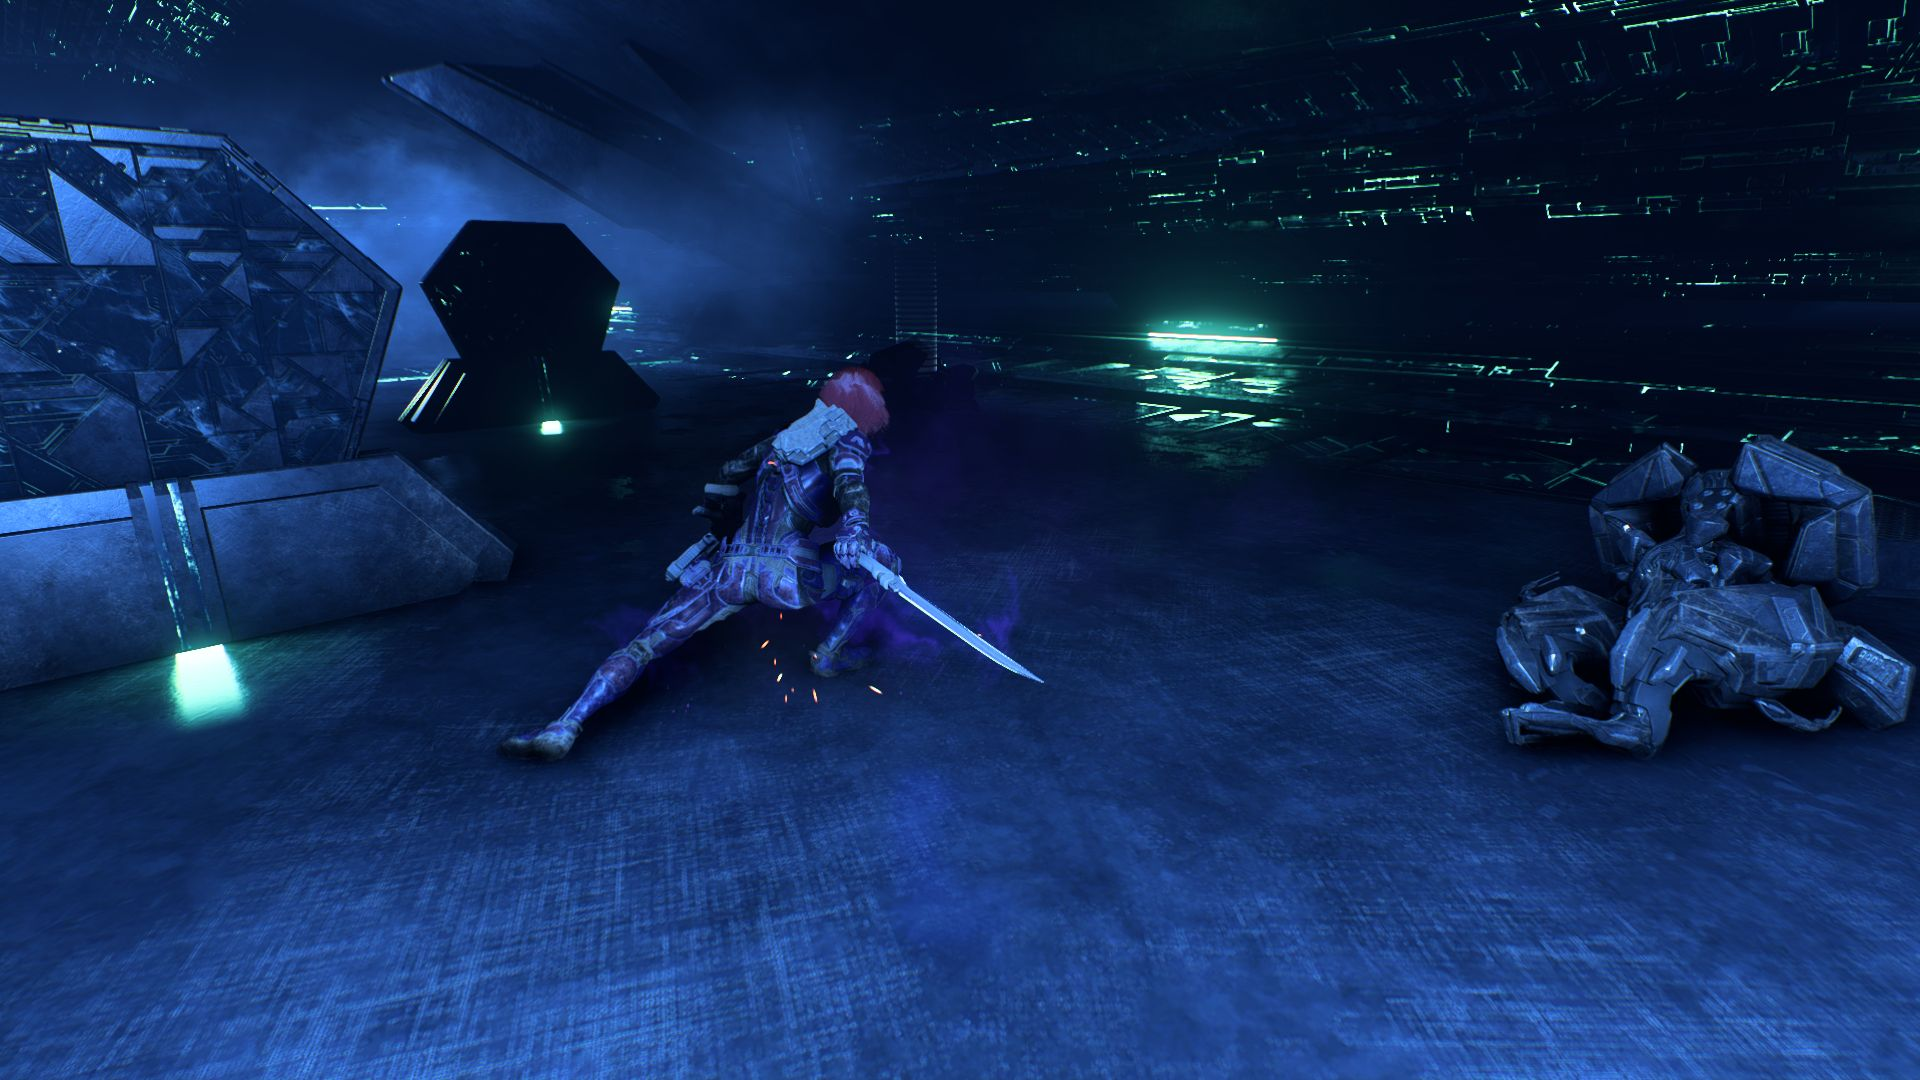 Mass Effect Andromeda Screenshot 2017.07.27 - 19.59.17.88.jpg - Mass Effect: Andromeda